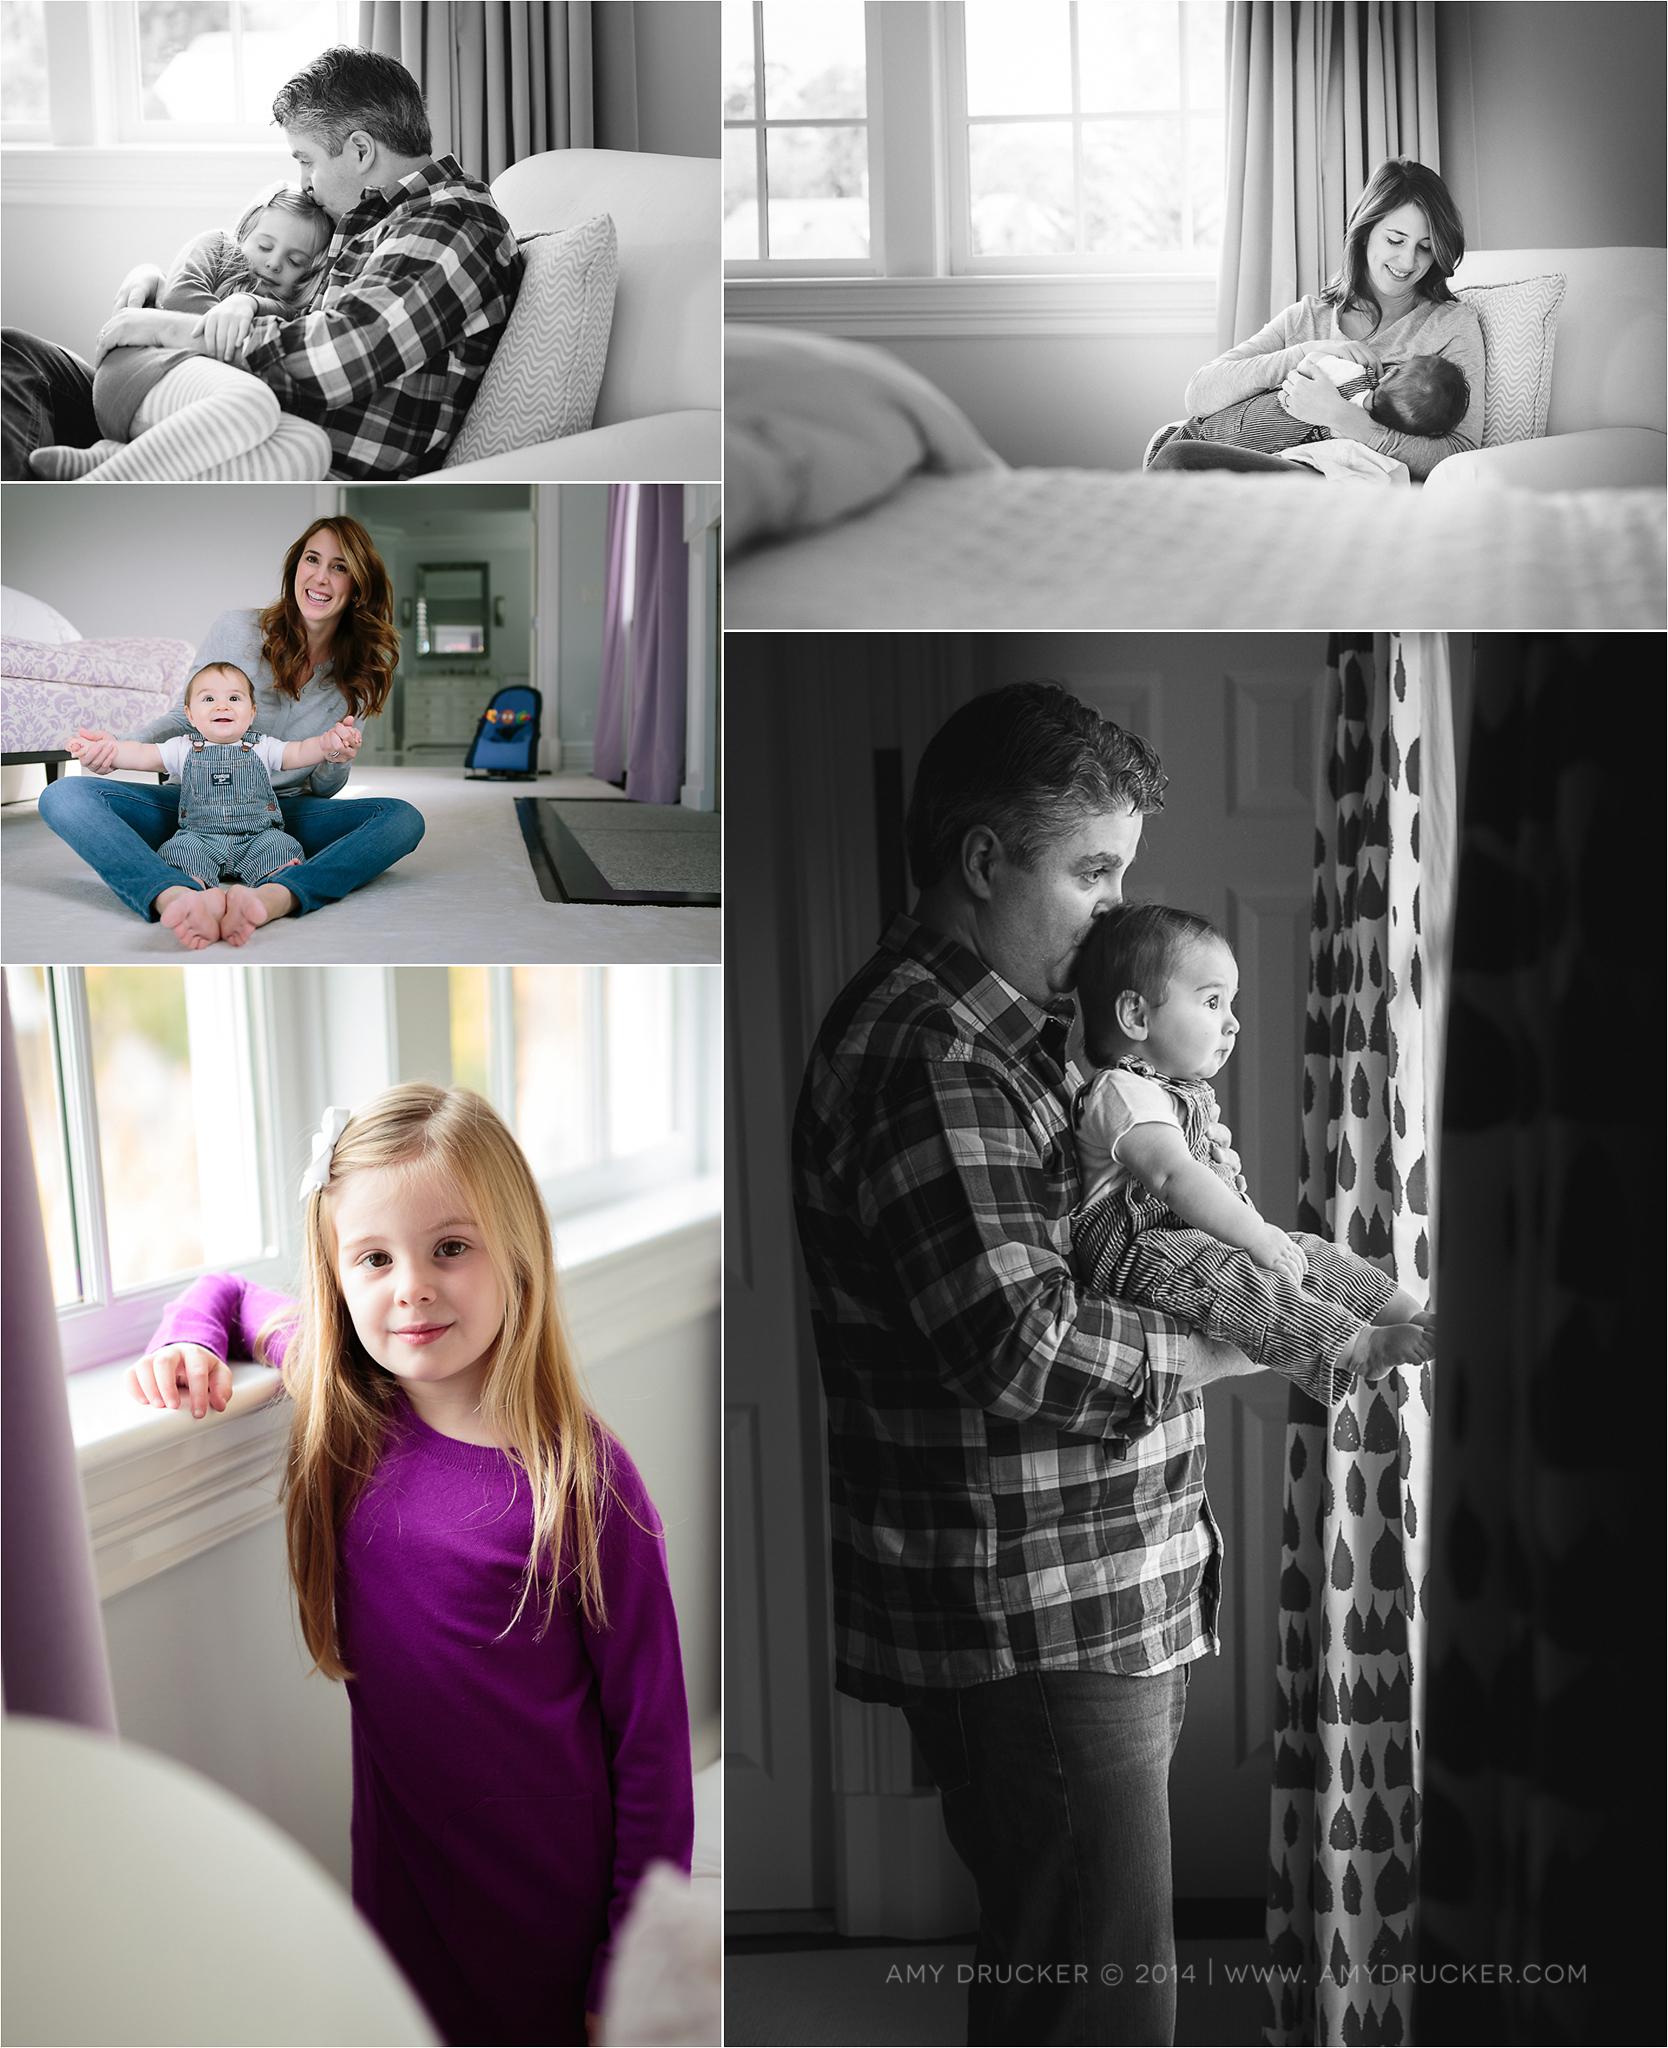 Amy_Drucker_New_York_Lifestyle_Photography4